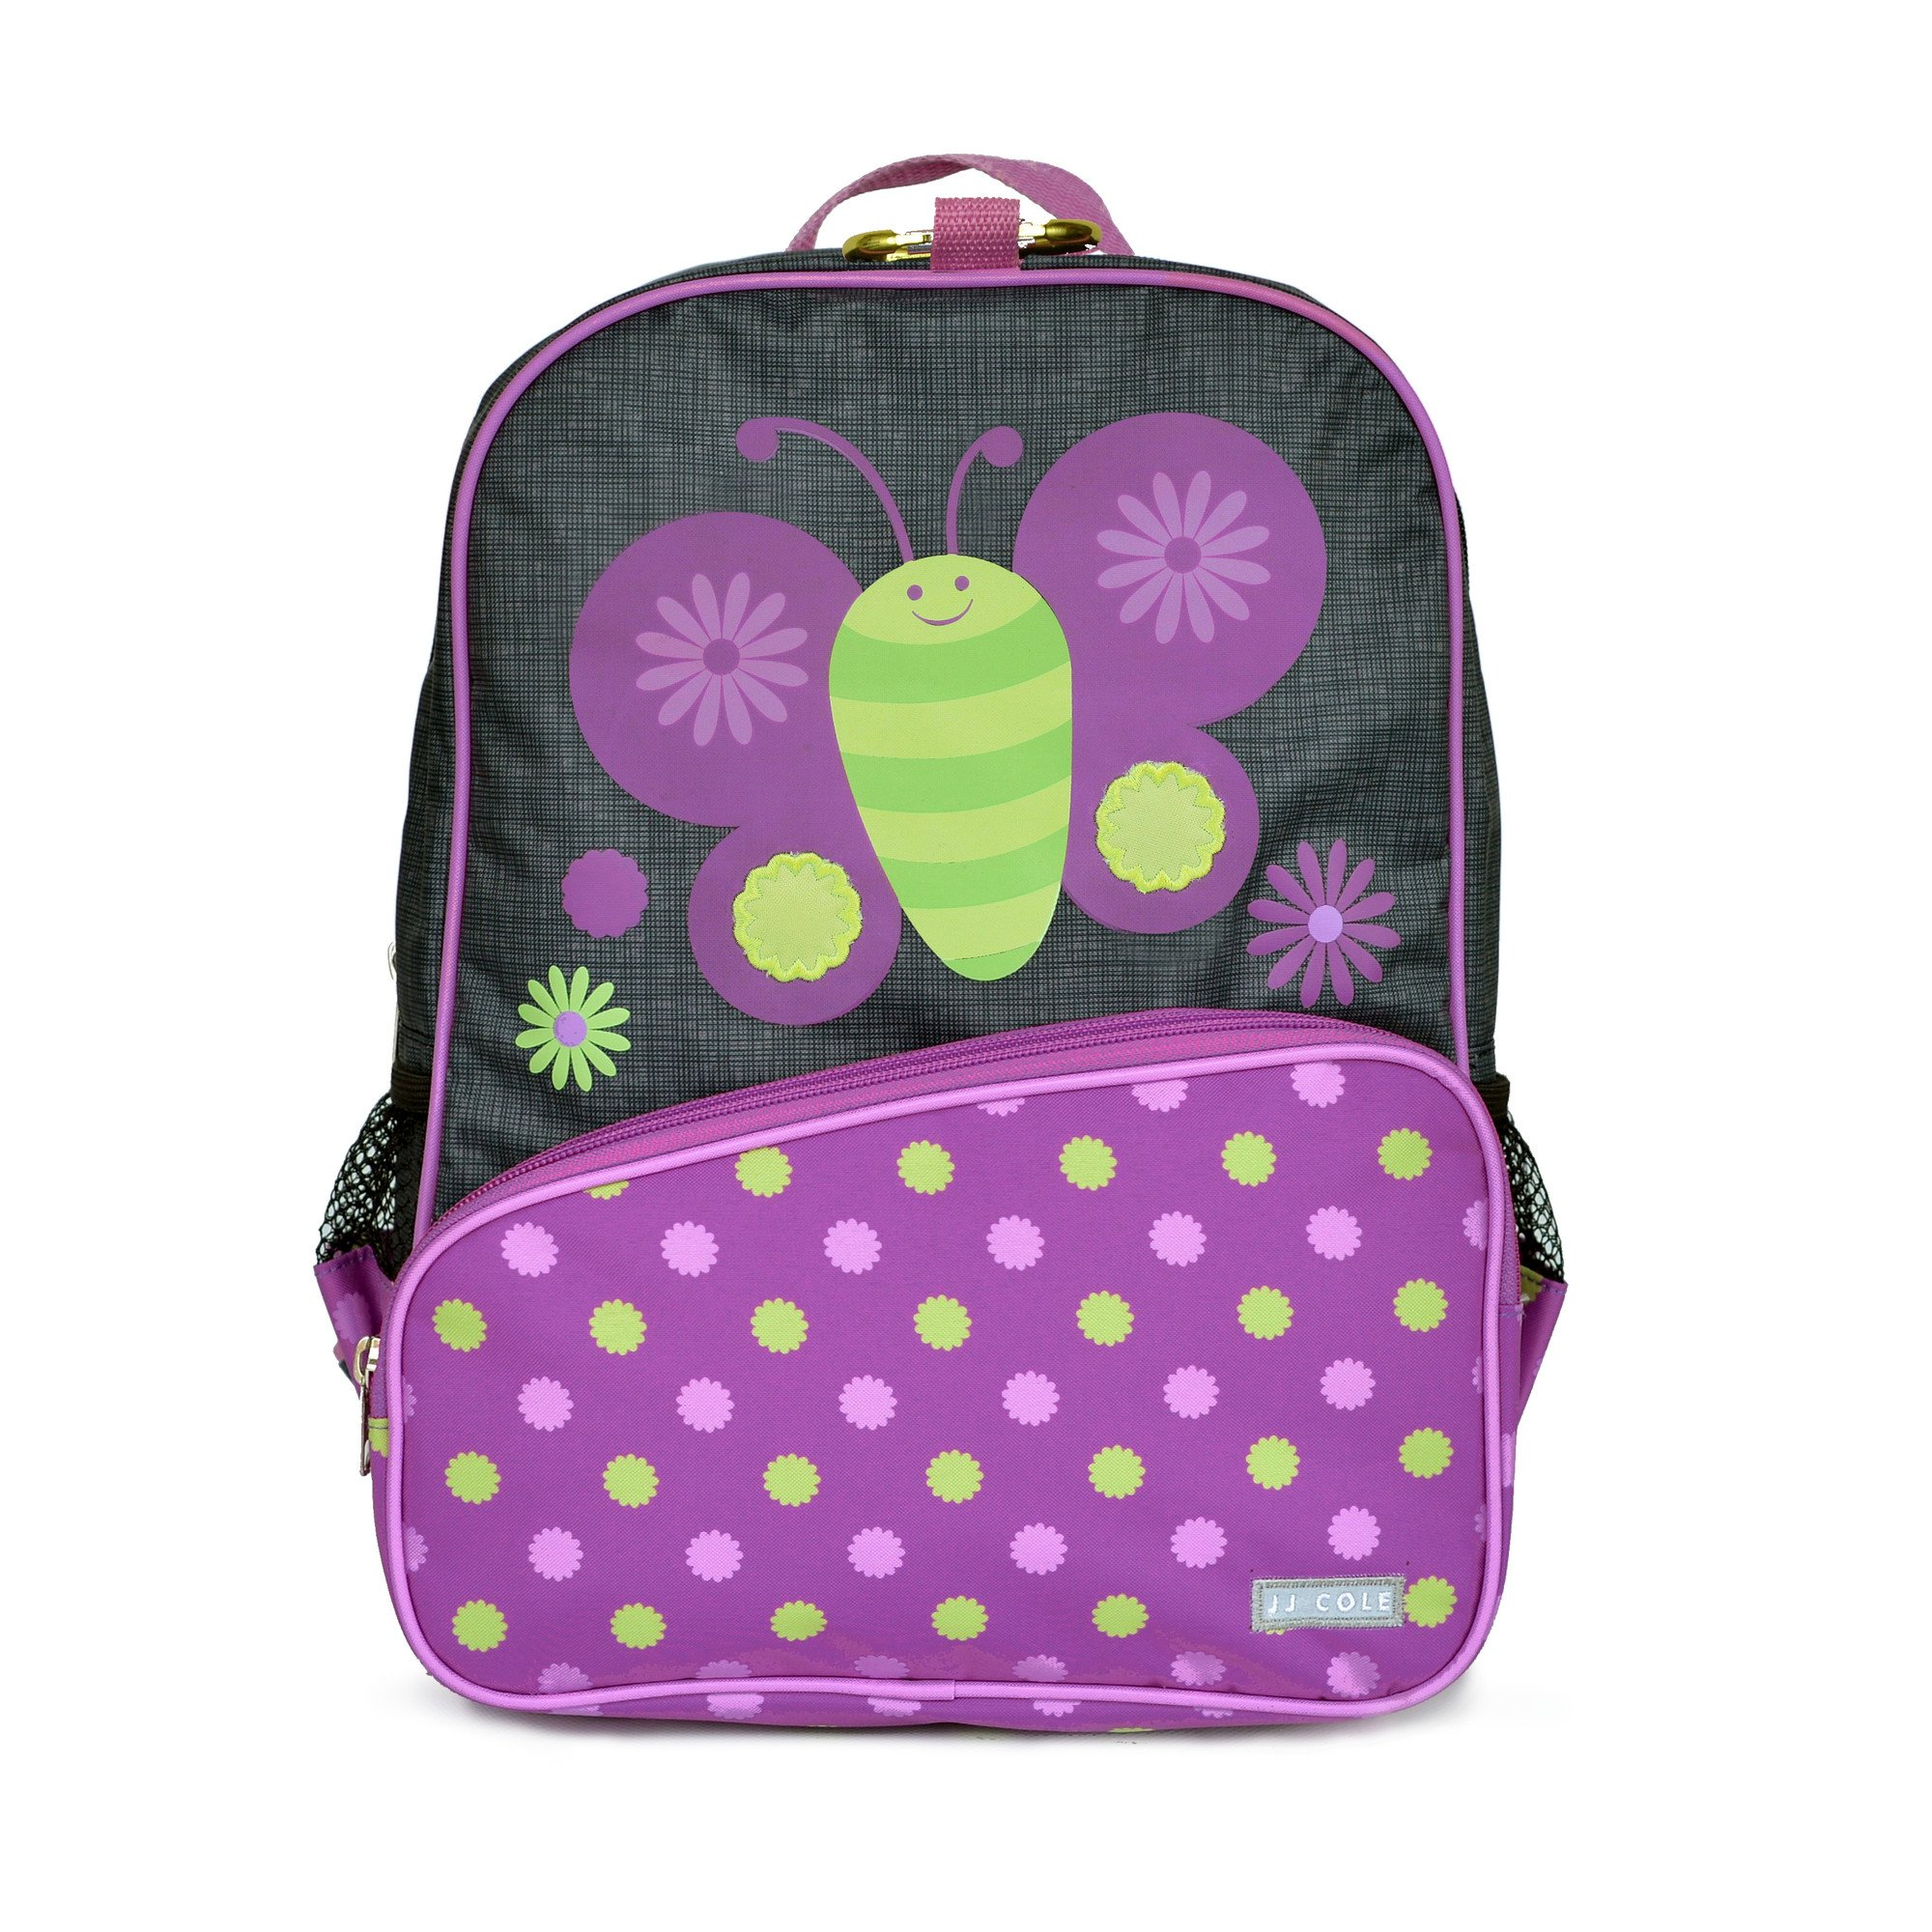 Little JJ Cole Toddler Backpack Butterfly